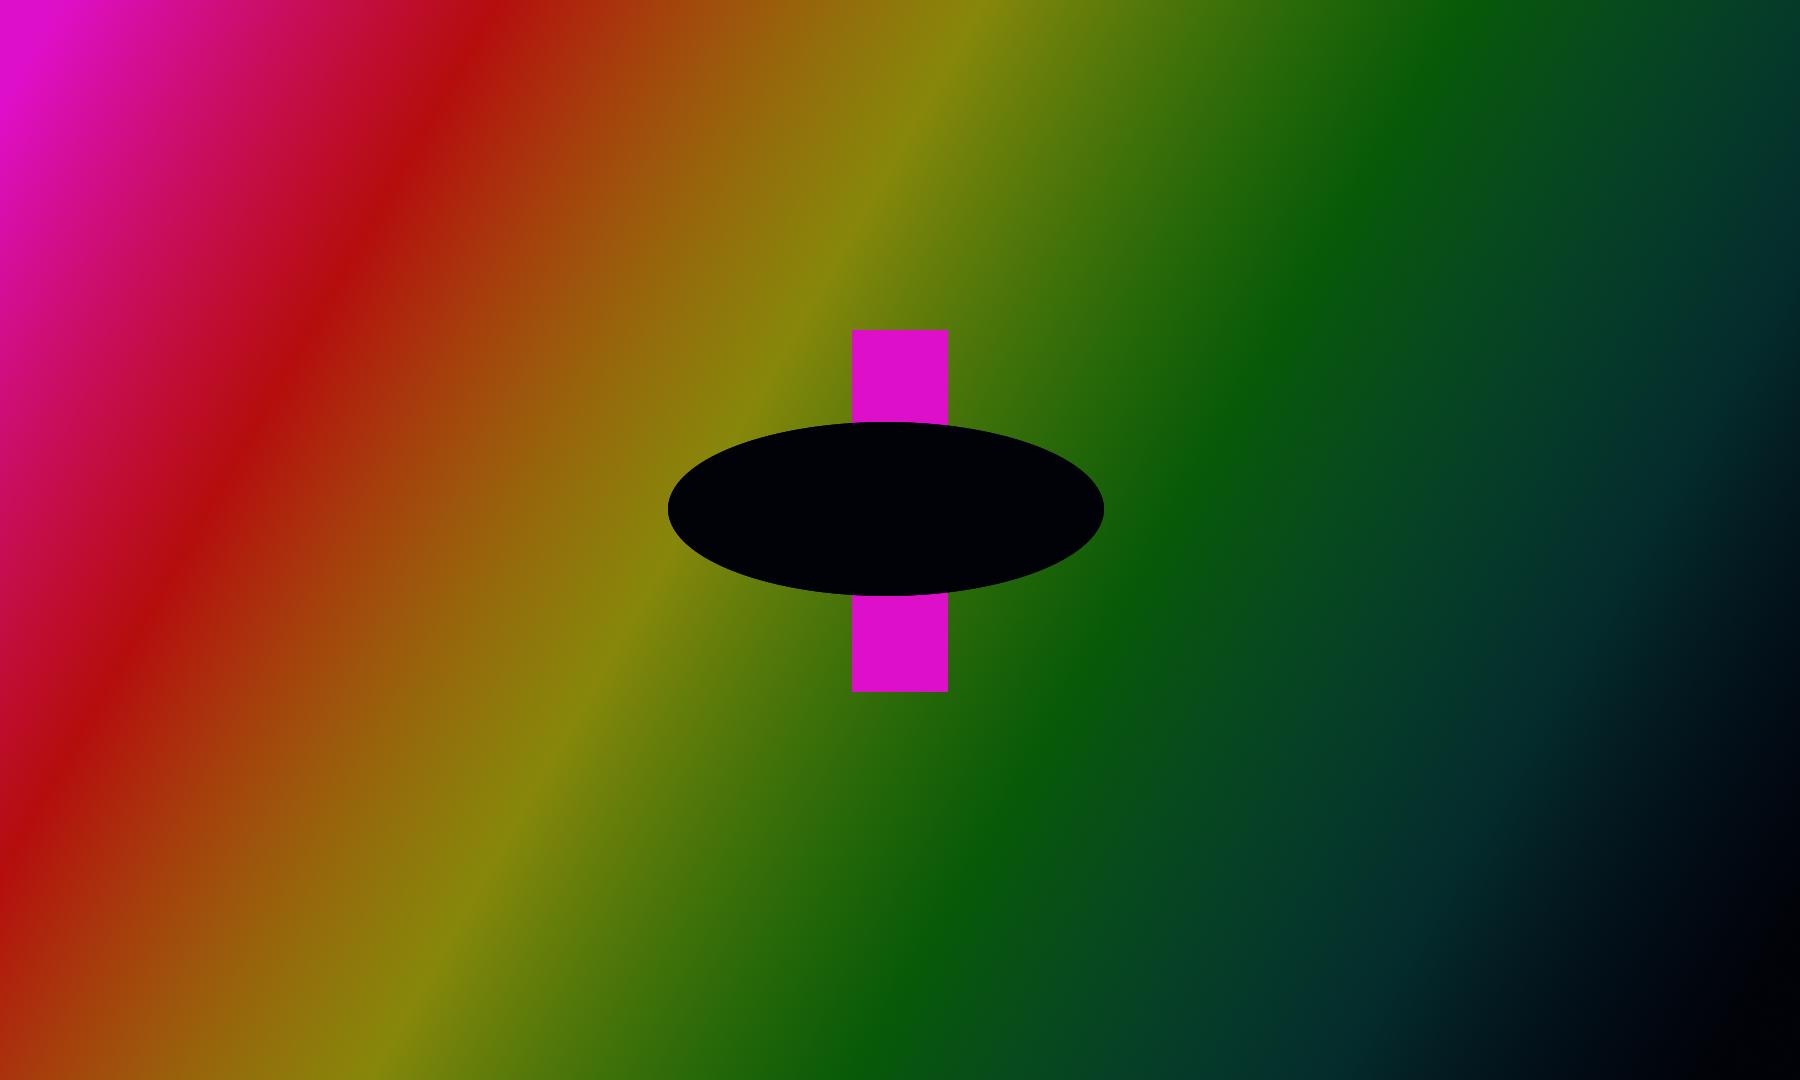 Image ID: 187789